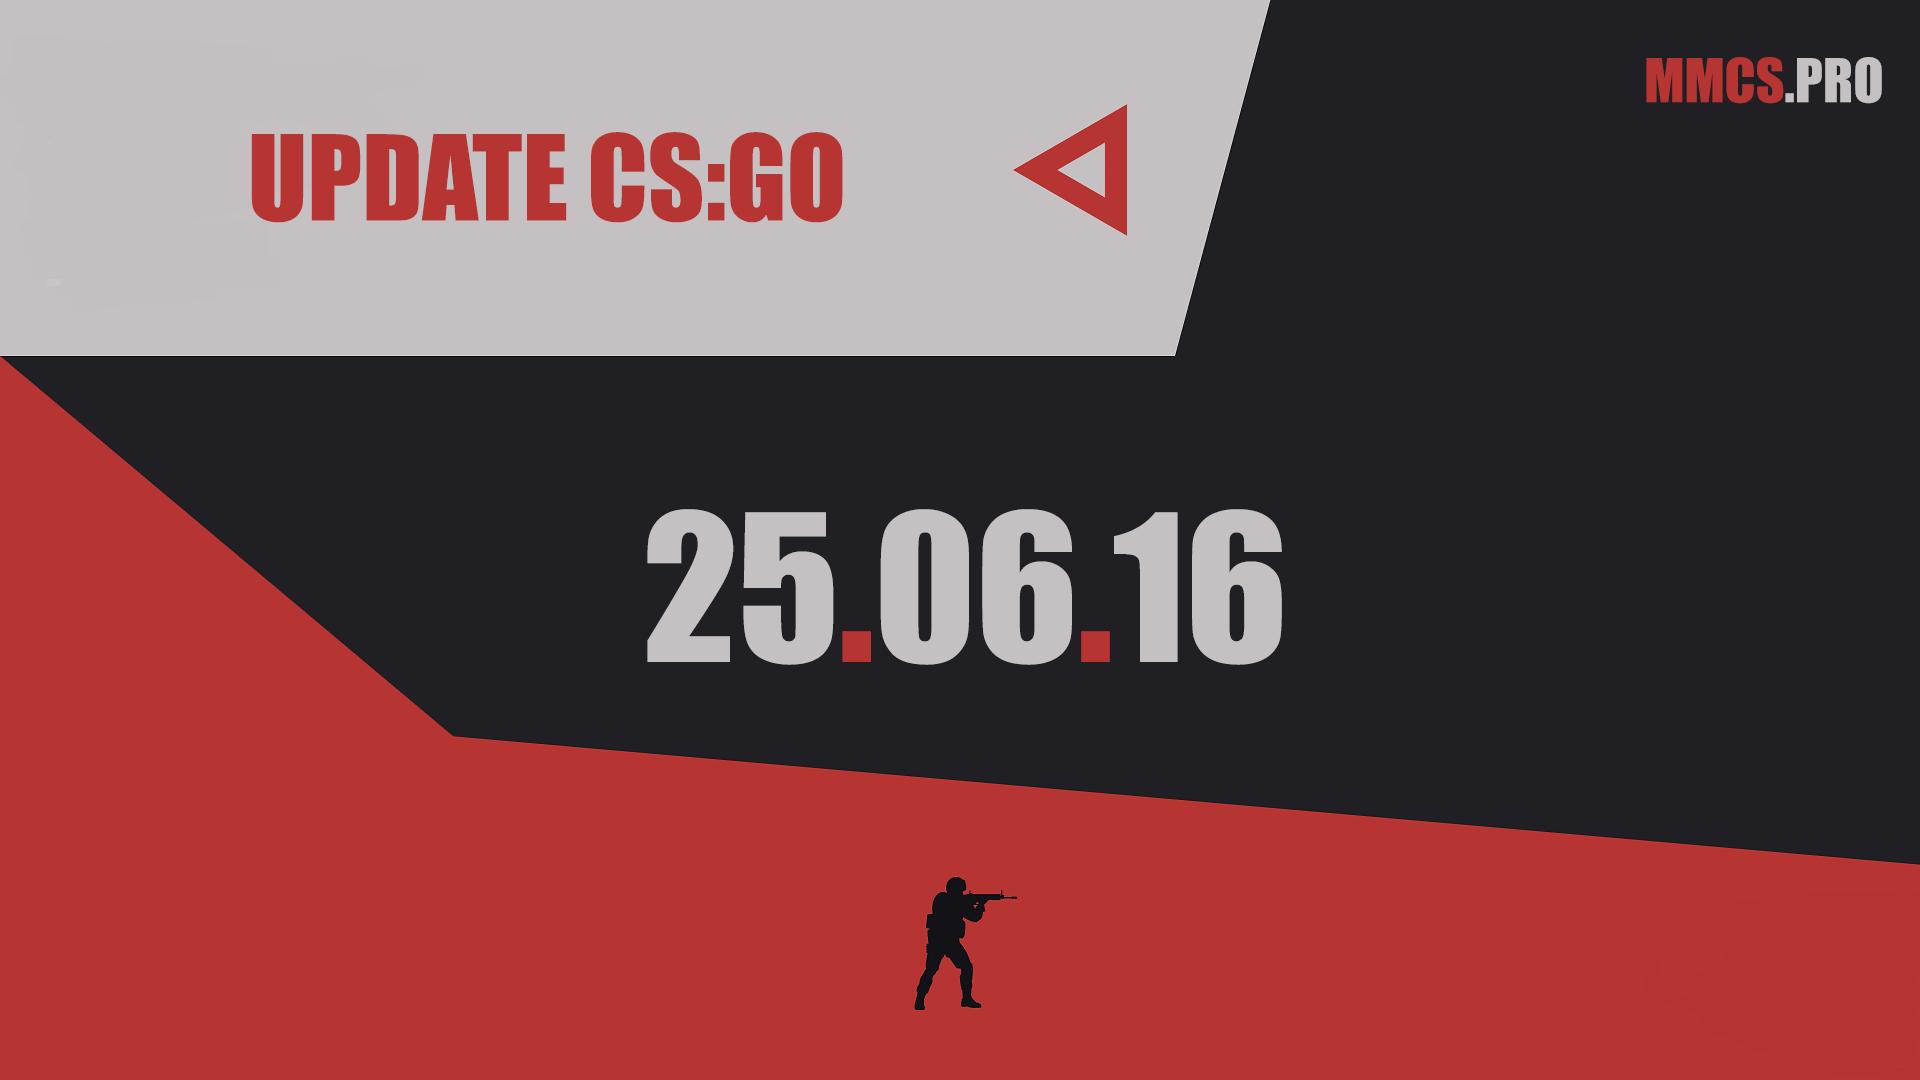 https://mmcs.pro/update-csgo-25-06-2016-valve/